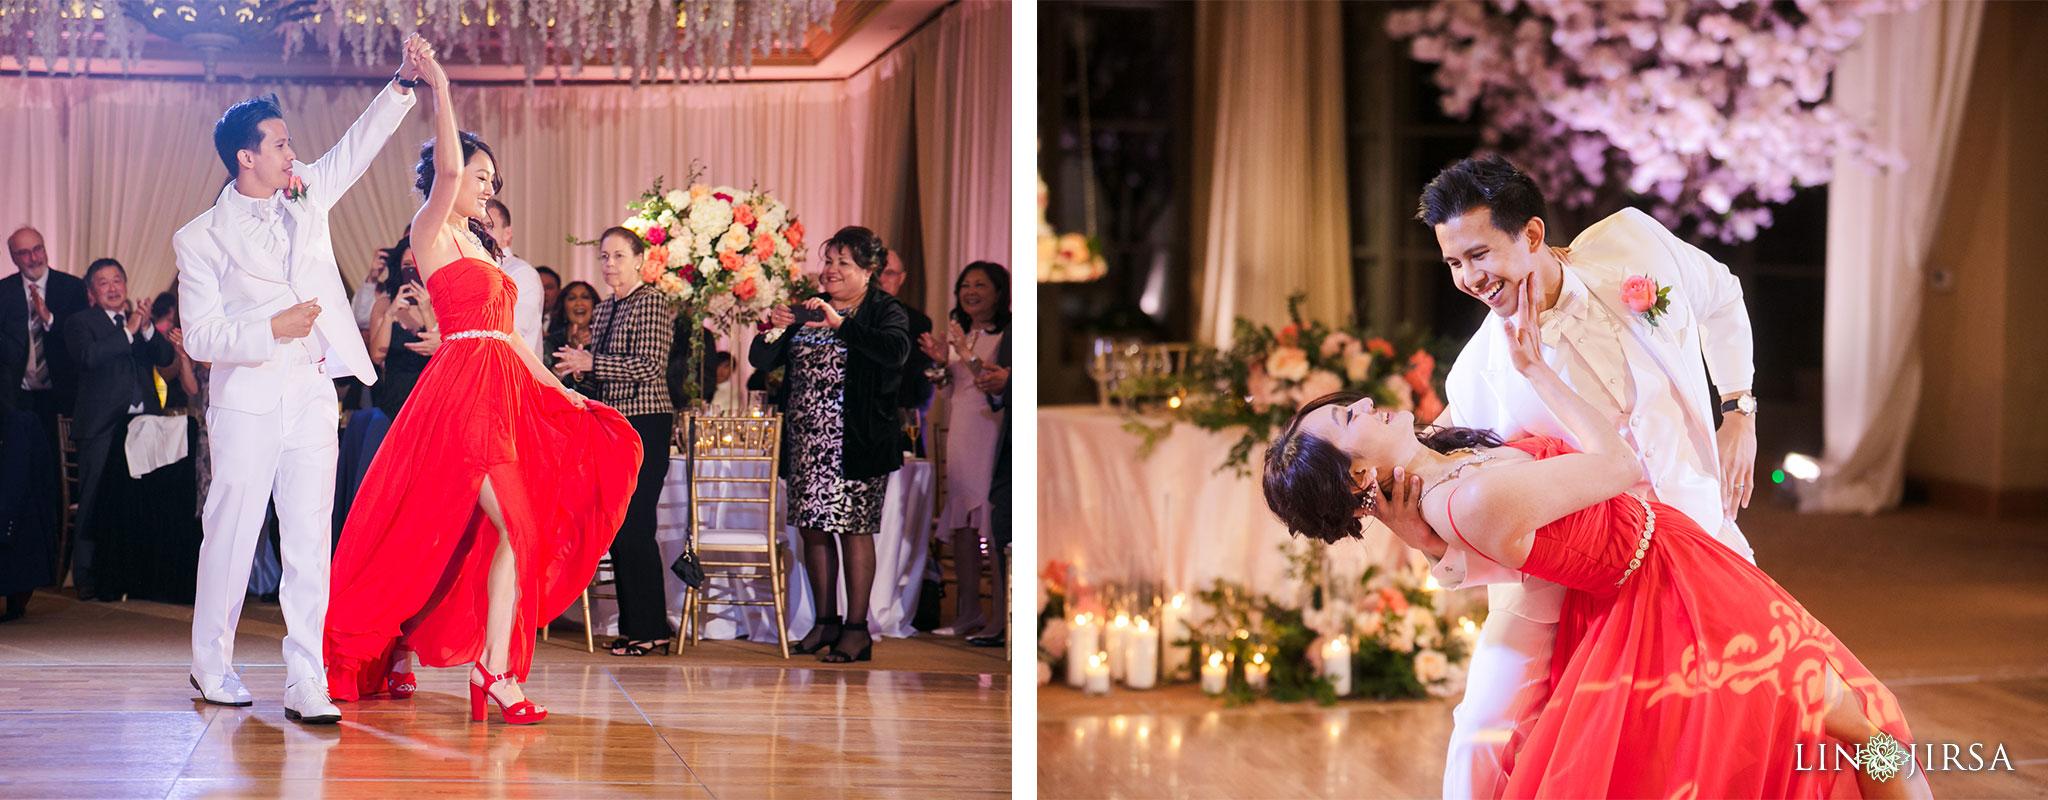 33 Pelican Hill Resort Orange County Wedding Photography